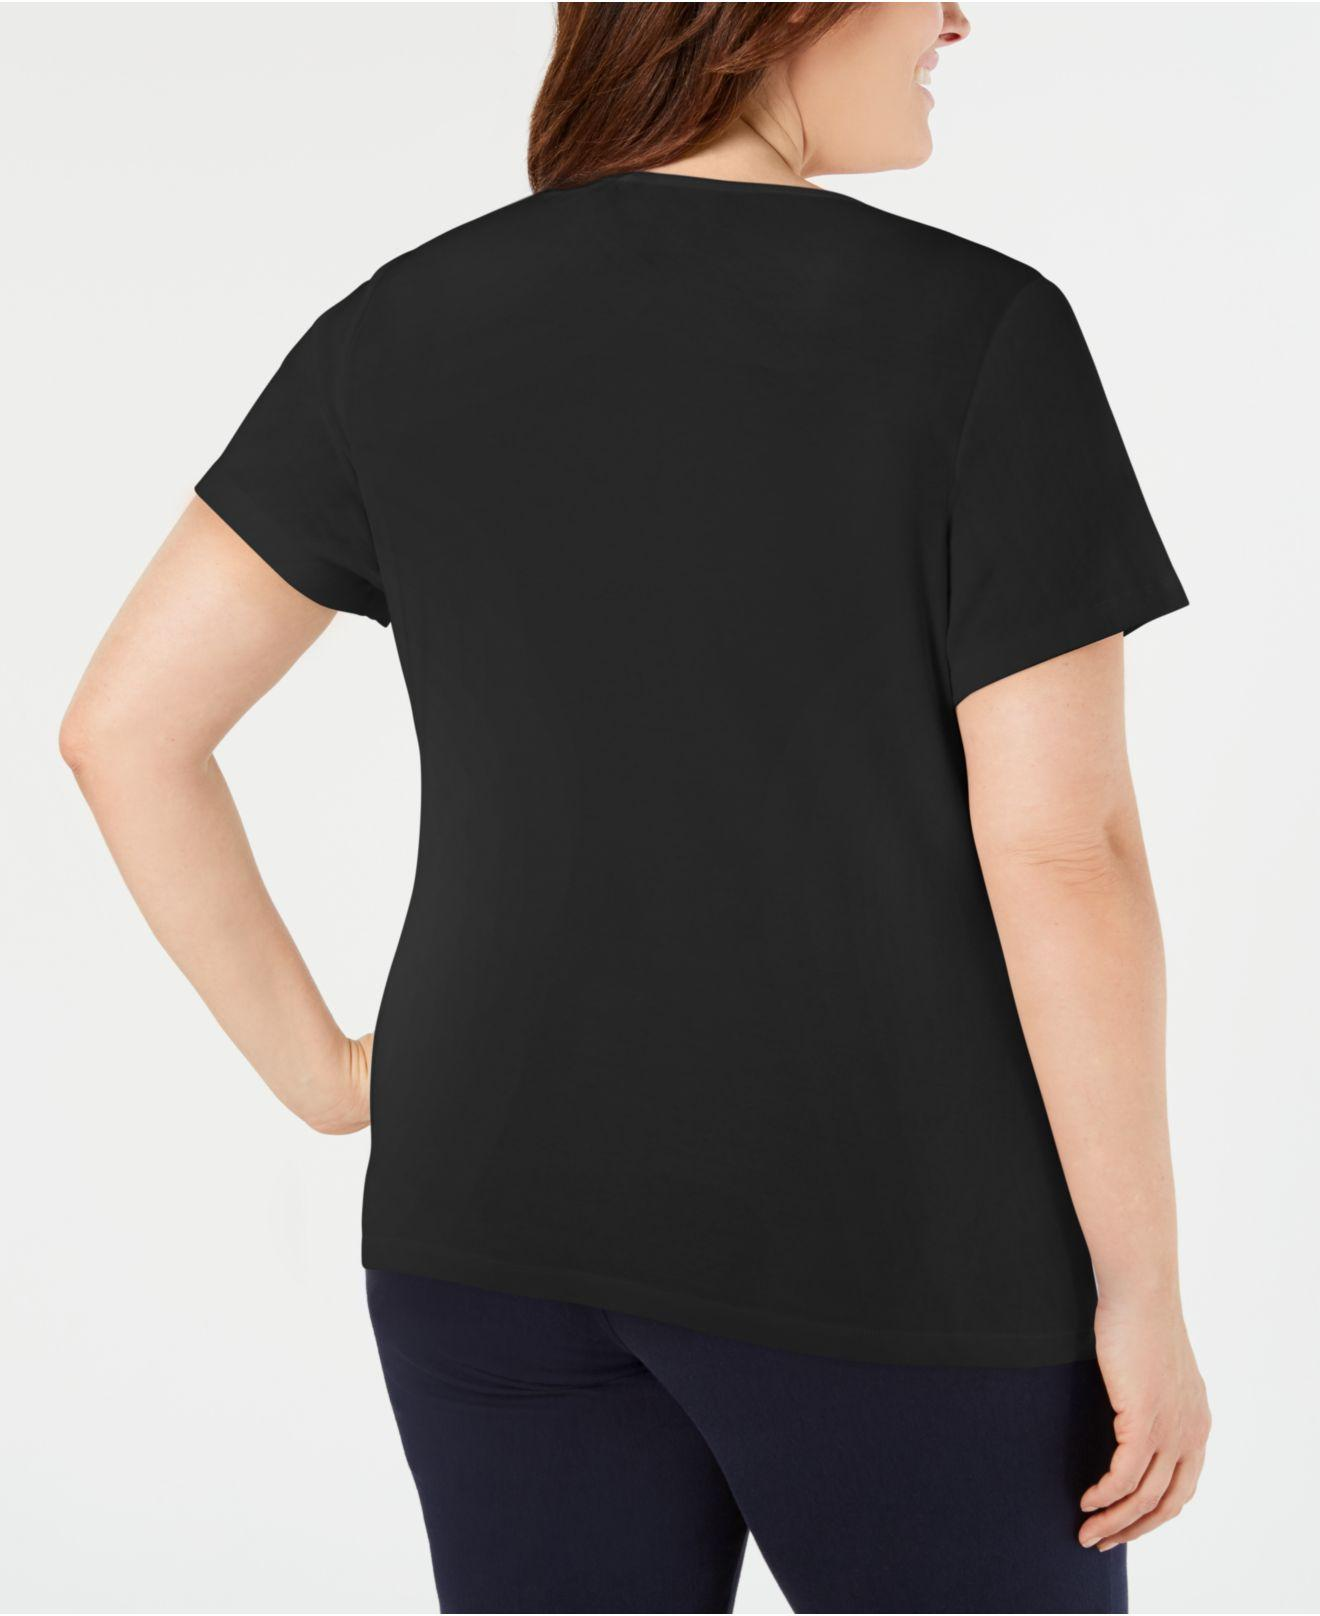 a2a1c9ddc4b Lyst - Karen Scott Plus Size Studded Scoop-neck Top